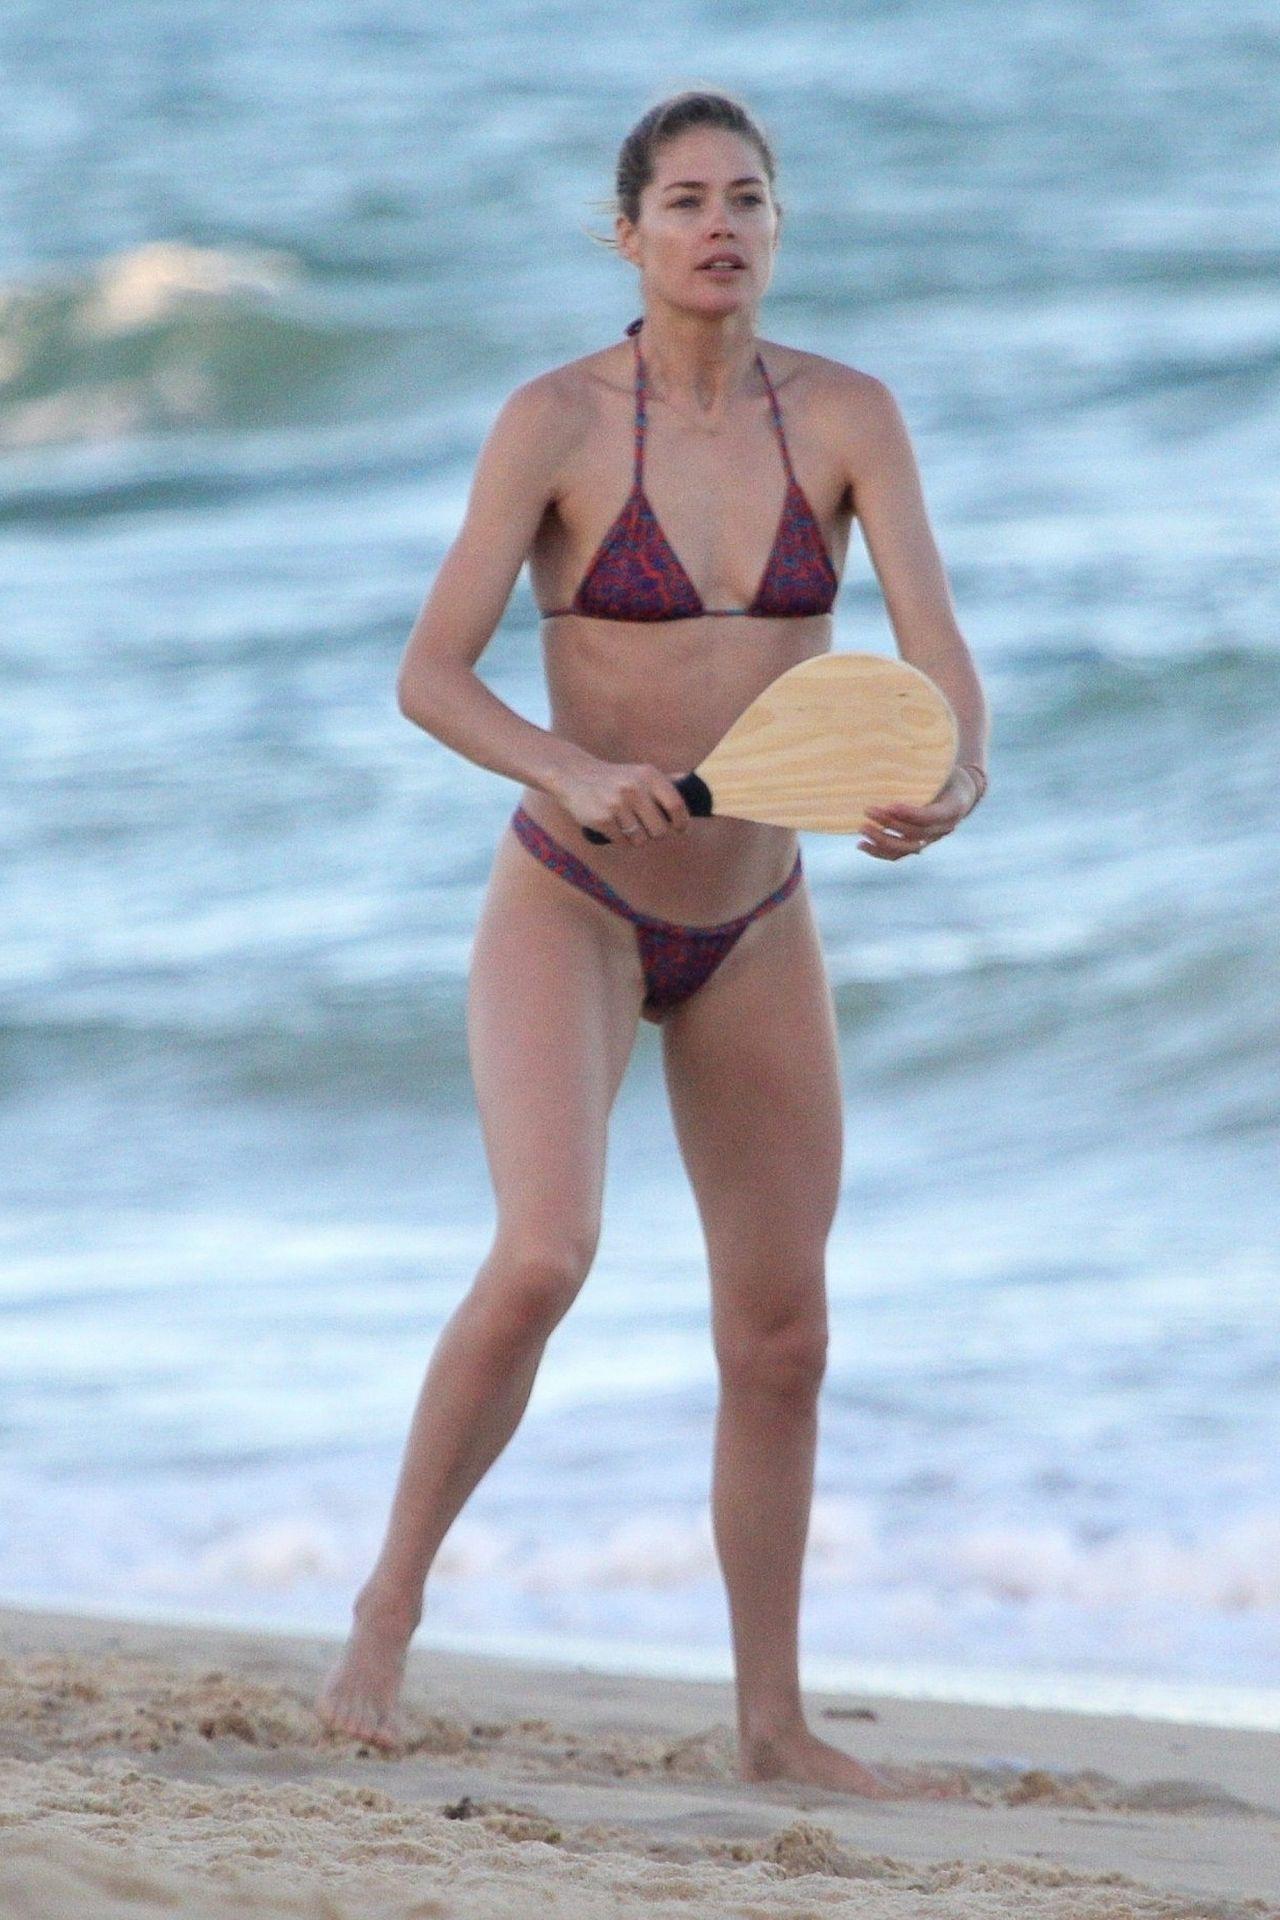 Doutzen Kroes in Bikini in Bahia Pic 2 of 35